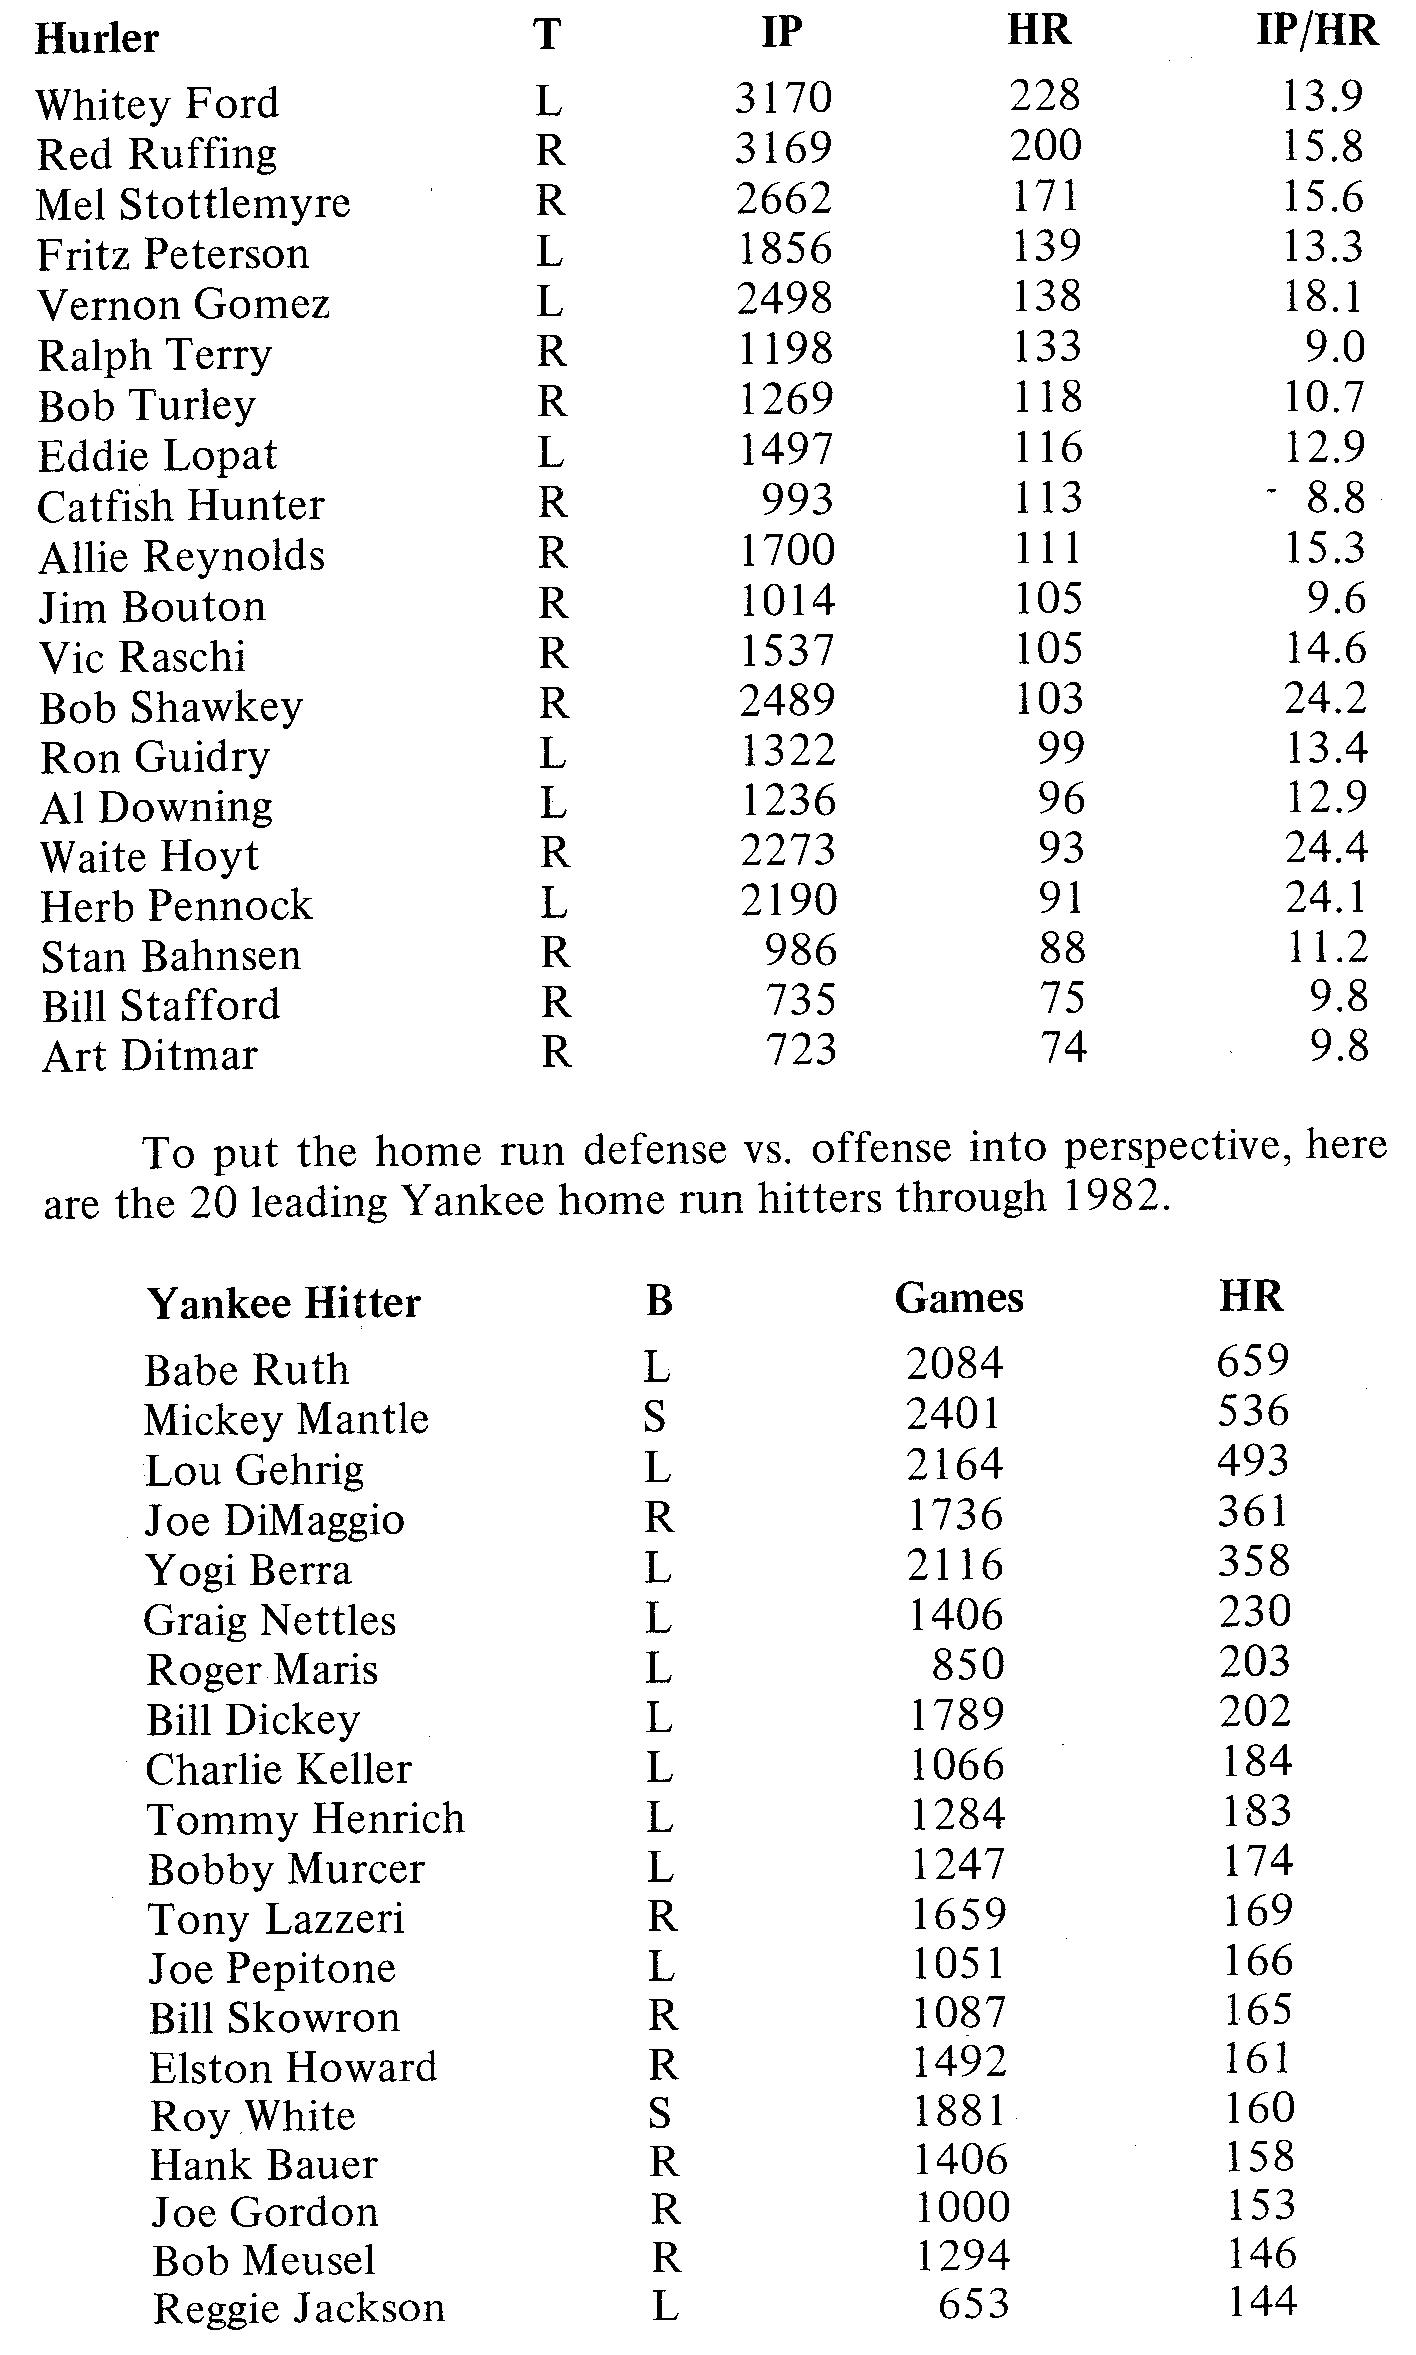 Table 2 (RAY GONZALEZ)